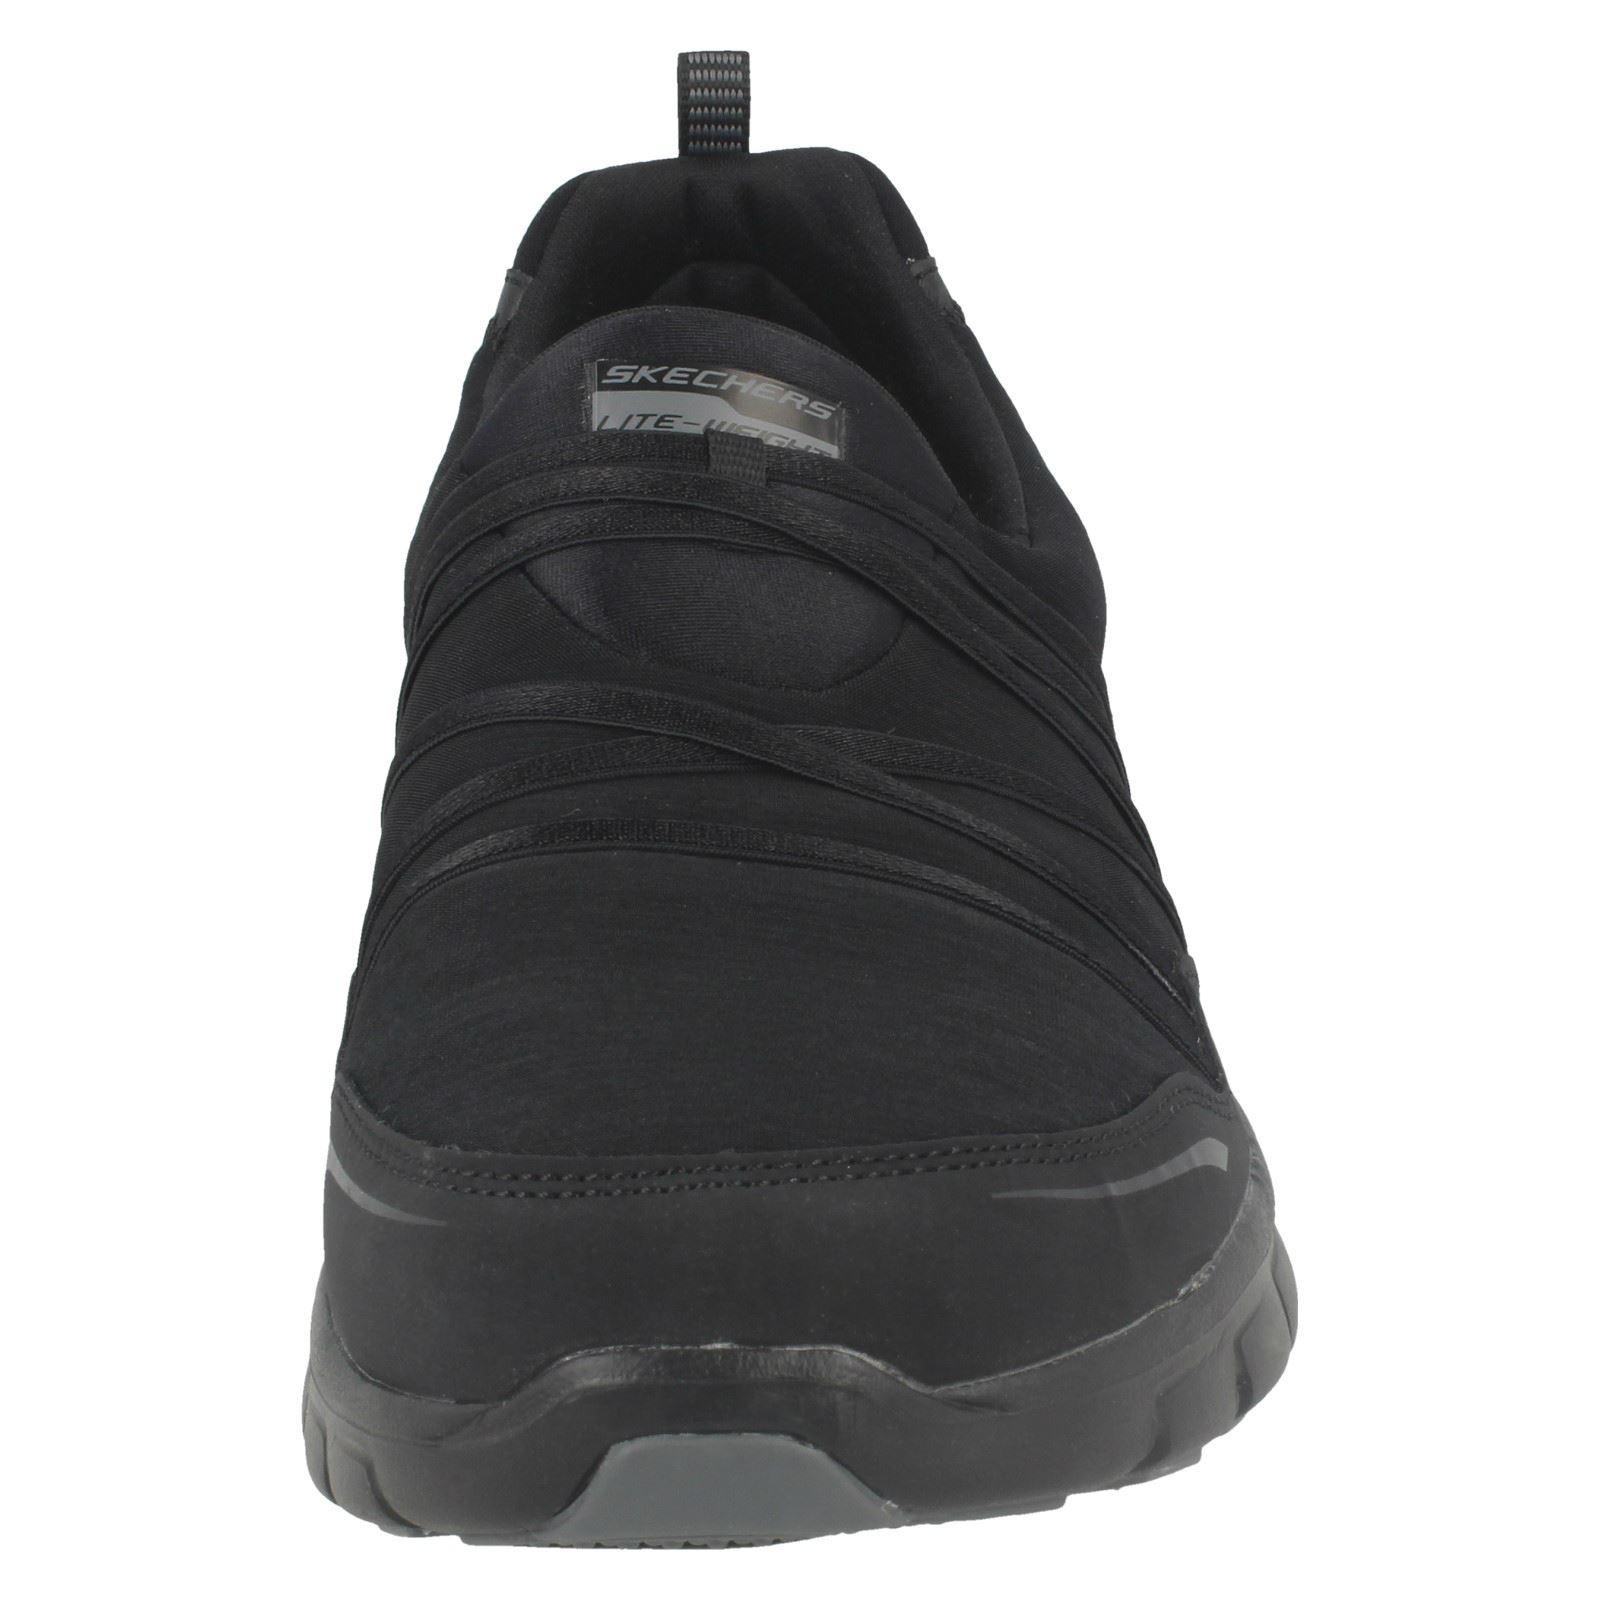 Donna Skechers Slip Scarpe On Tessile Scarpe Slip da ginnastica sinergia scene STEALER 12004 4d98ba